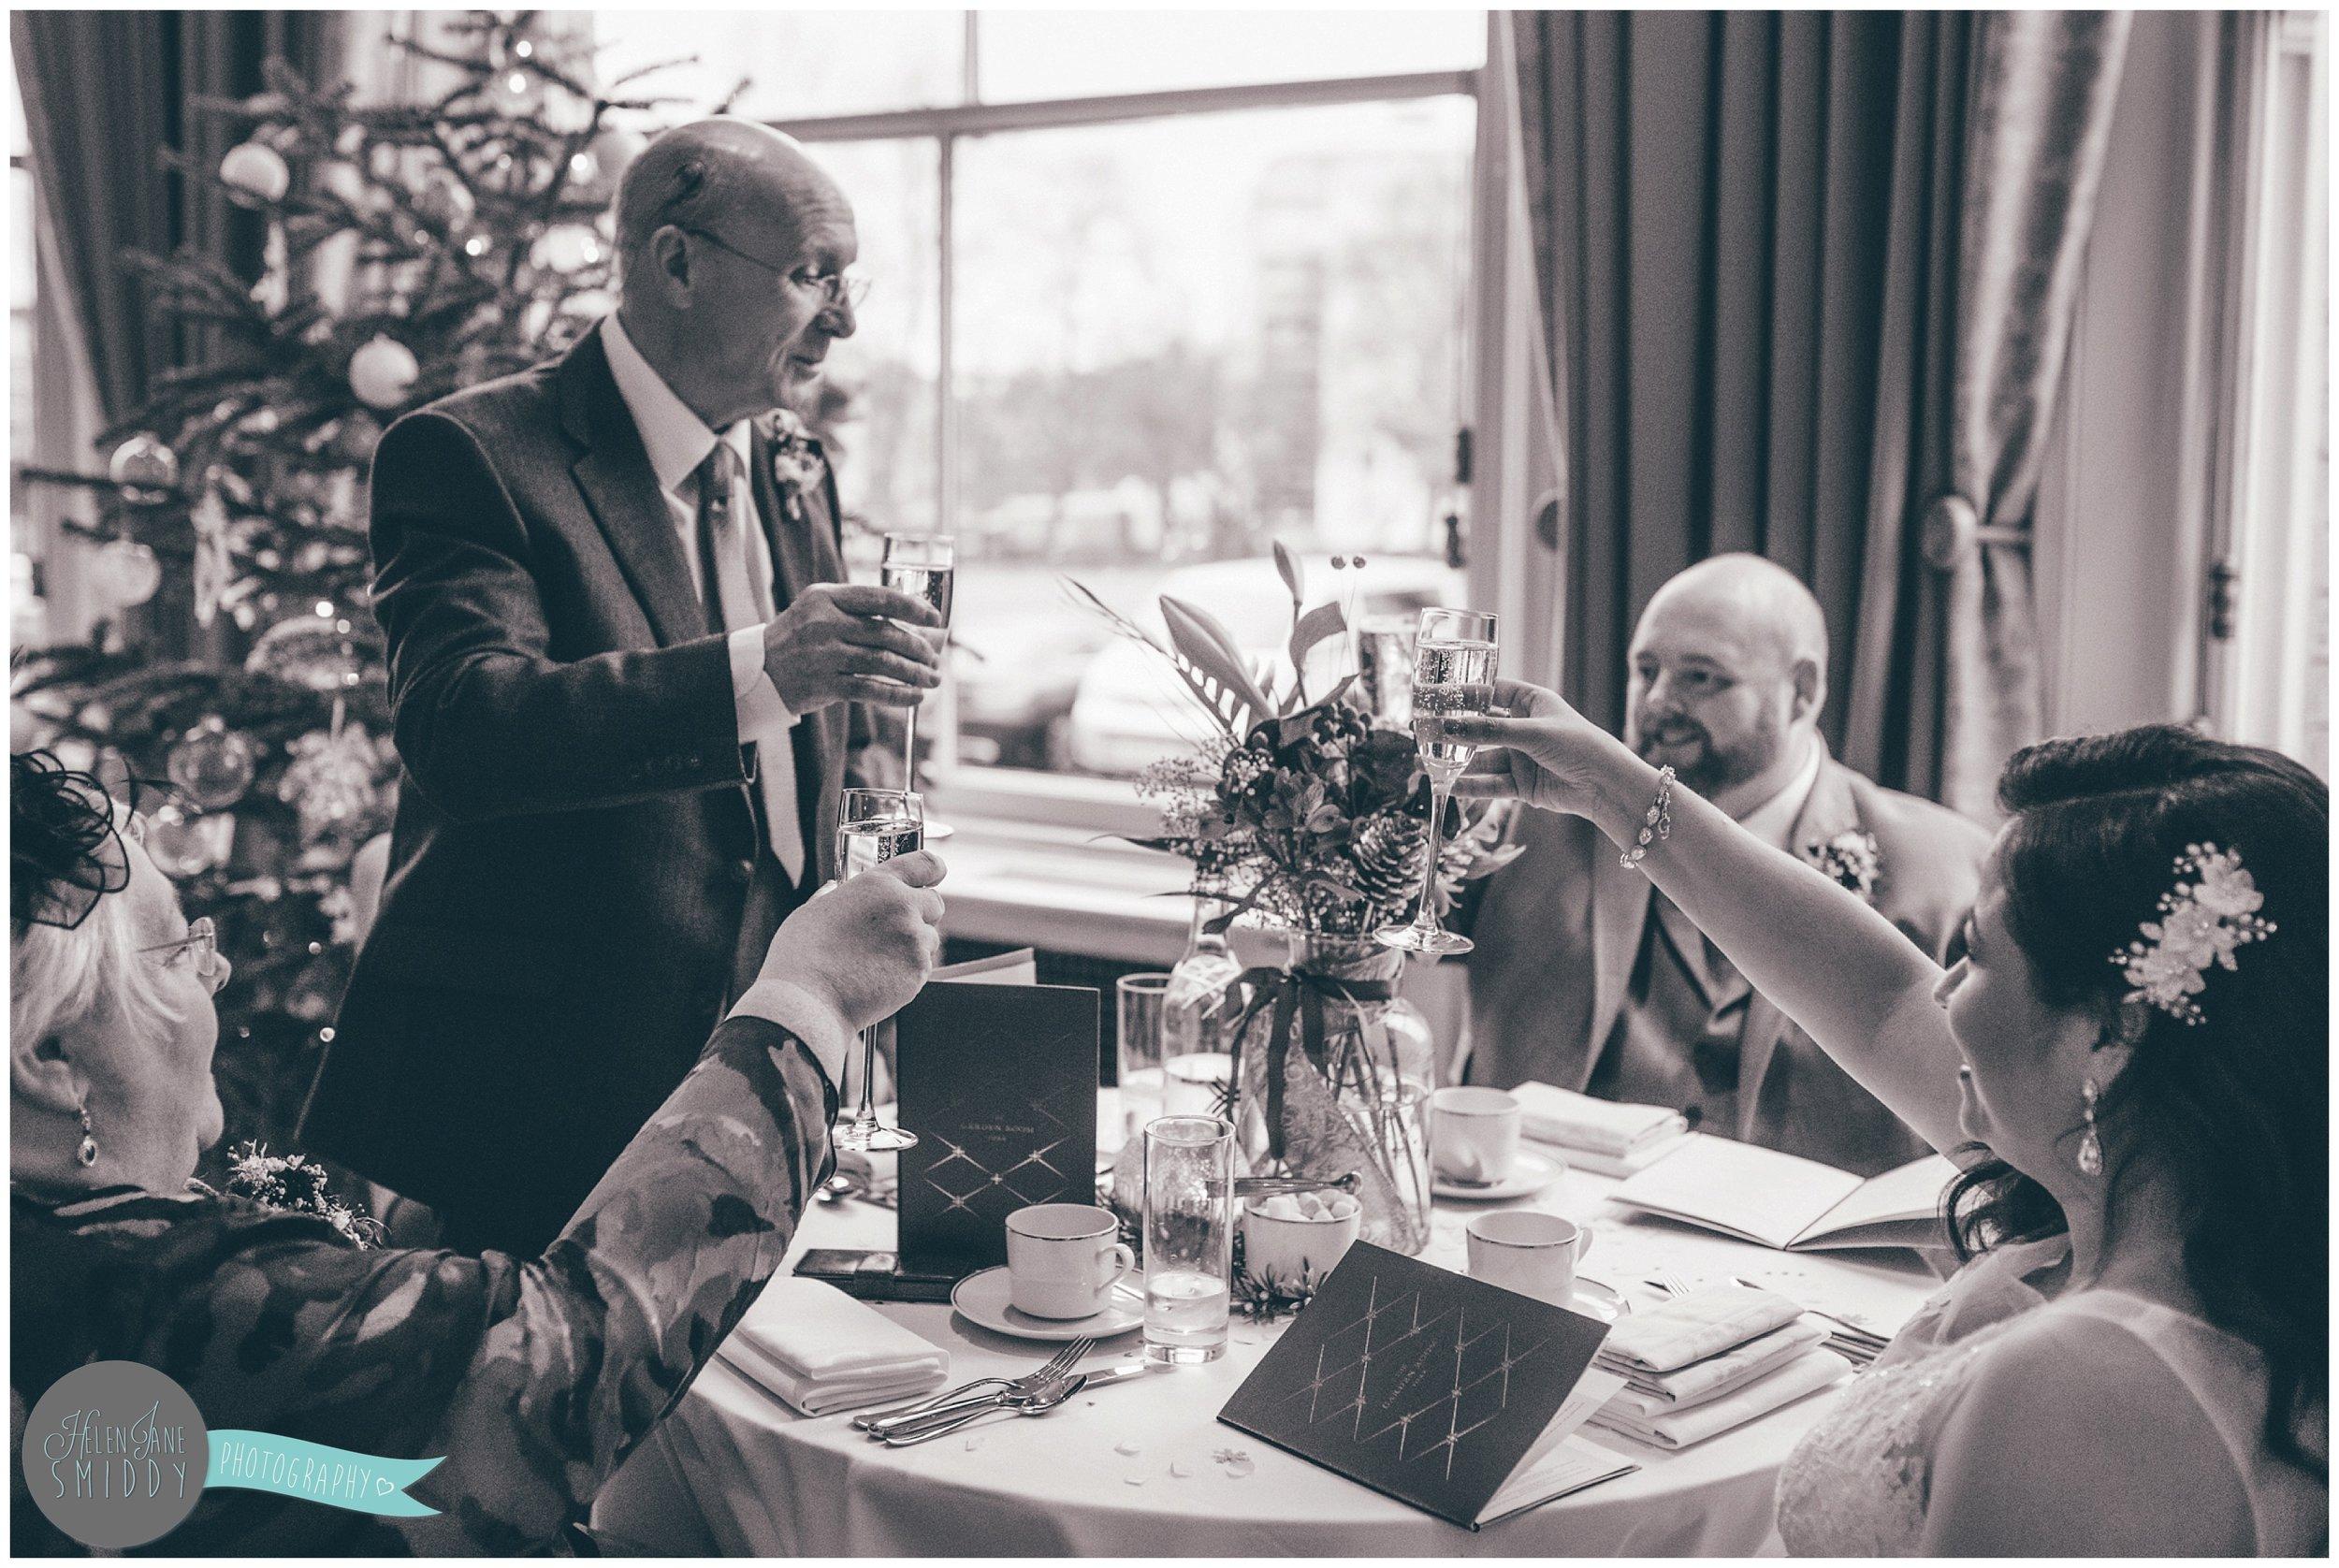 christmas-christmaswedding-wedding-cheshire-cheshirewedding-cheshireweddingphotography-weddingphotography-weddingphotographer-cheshireweddingphotograpger-york-cheshirewedding-yorkwedding-christmaseve